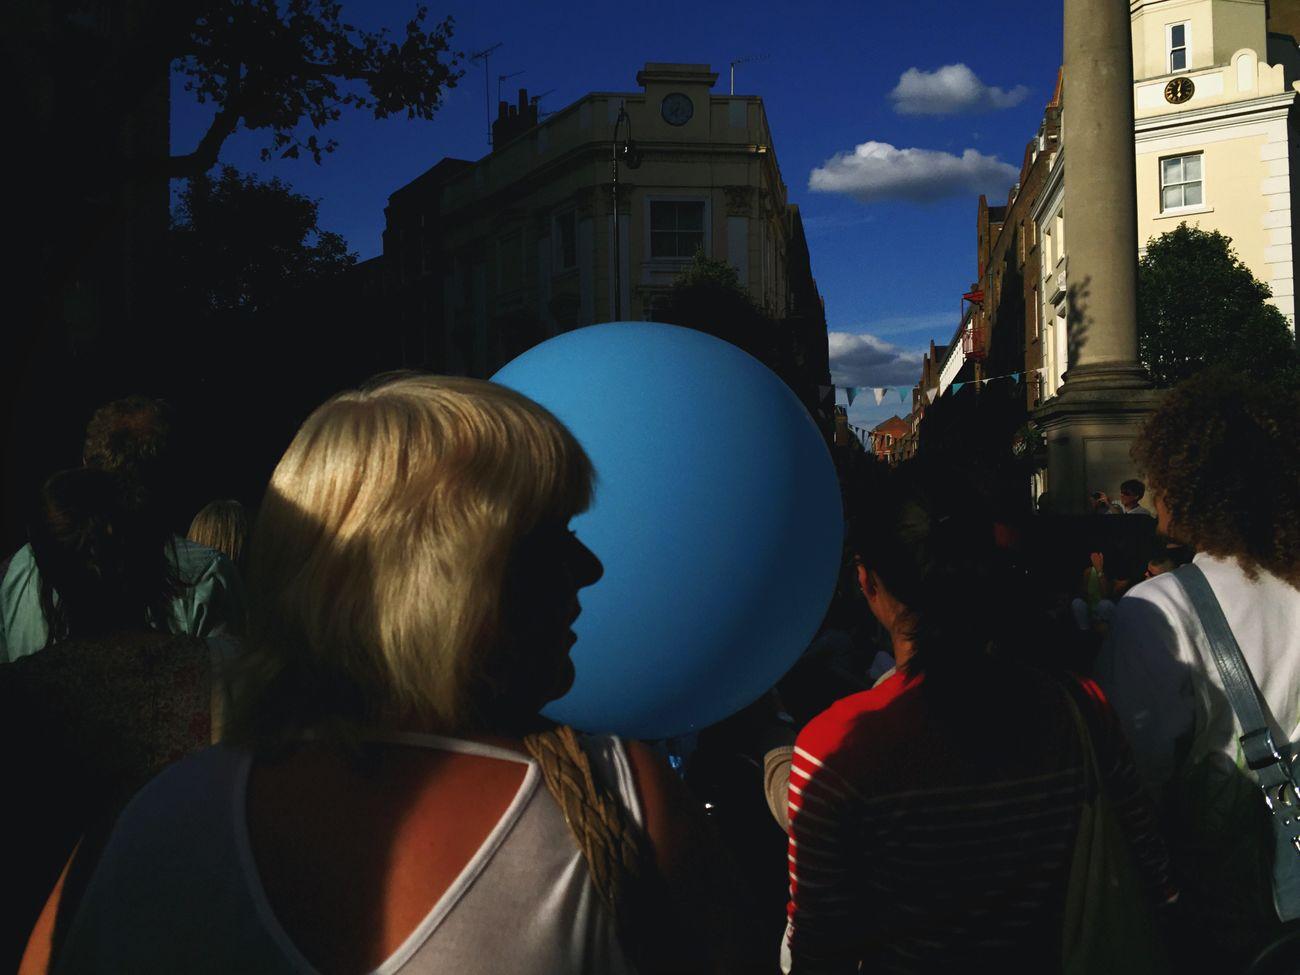 Urban Lifestyle People Watching London IPhone